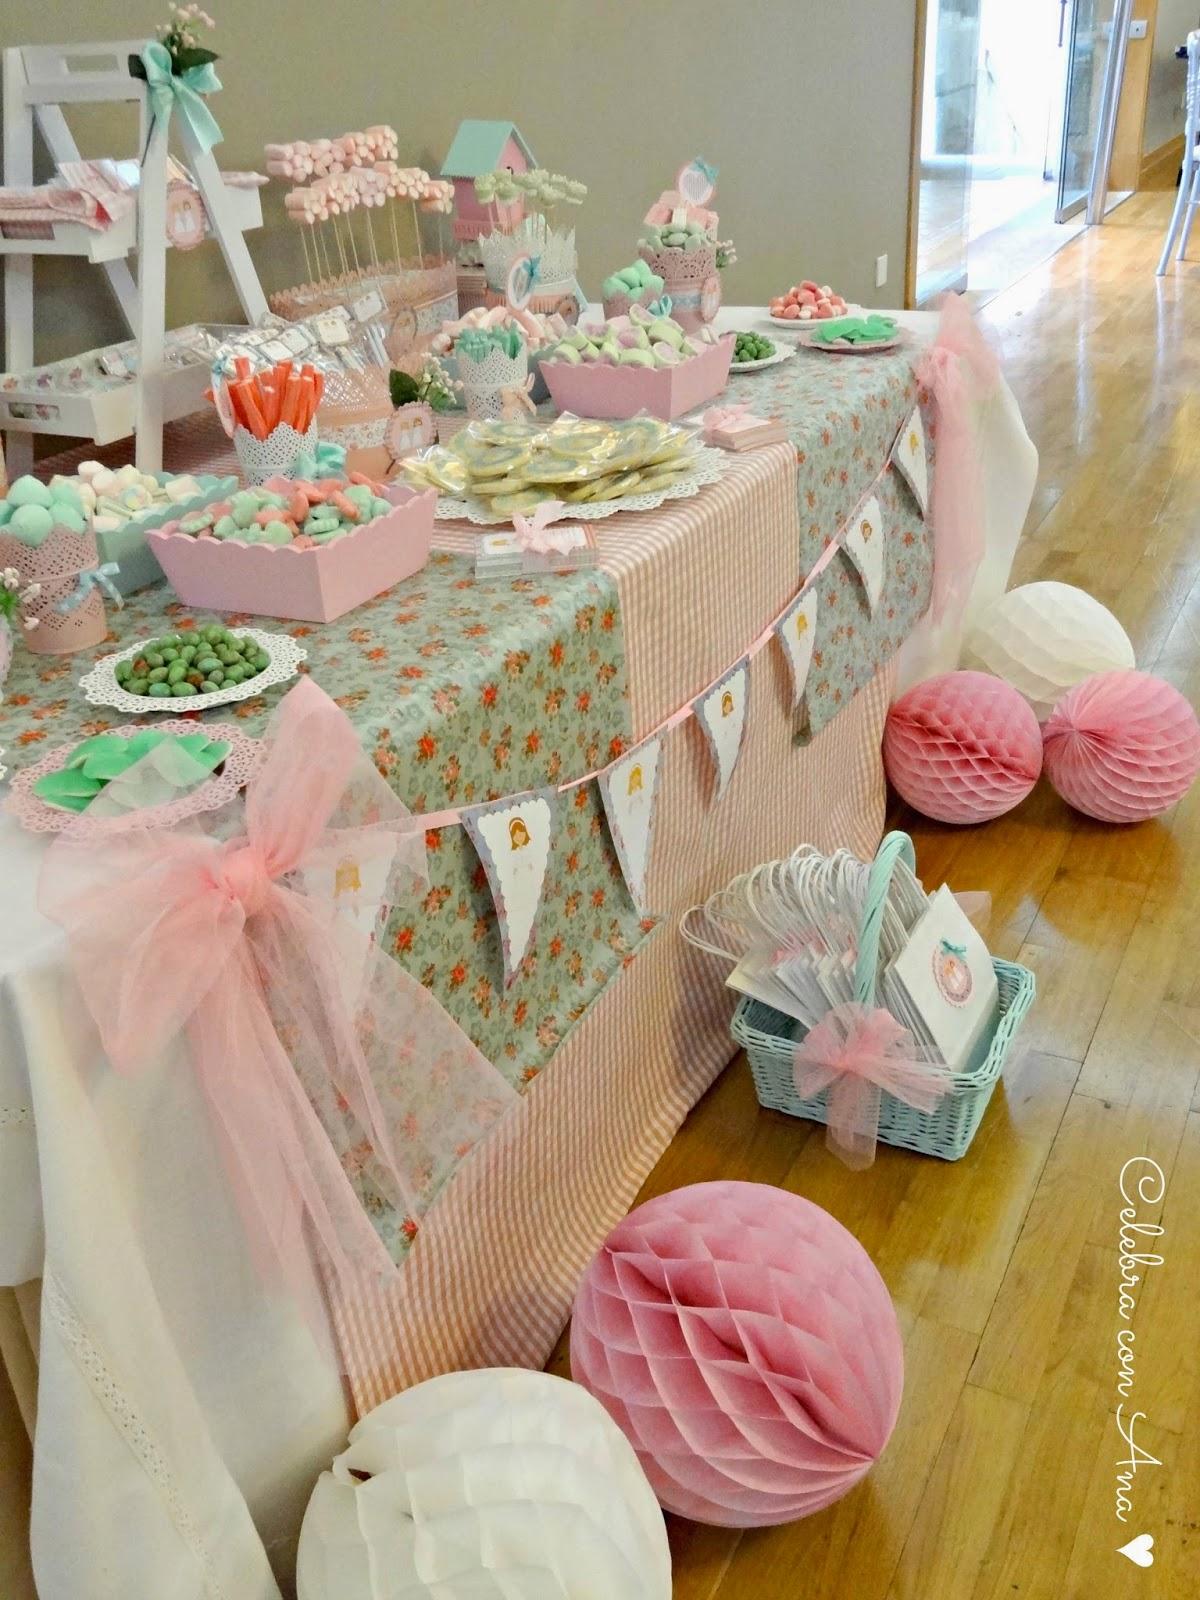 Celebra con ana compartiendo experiencias creativas primera comuni n shabby chic - Ideas para decorar mesas de chuches ...